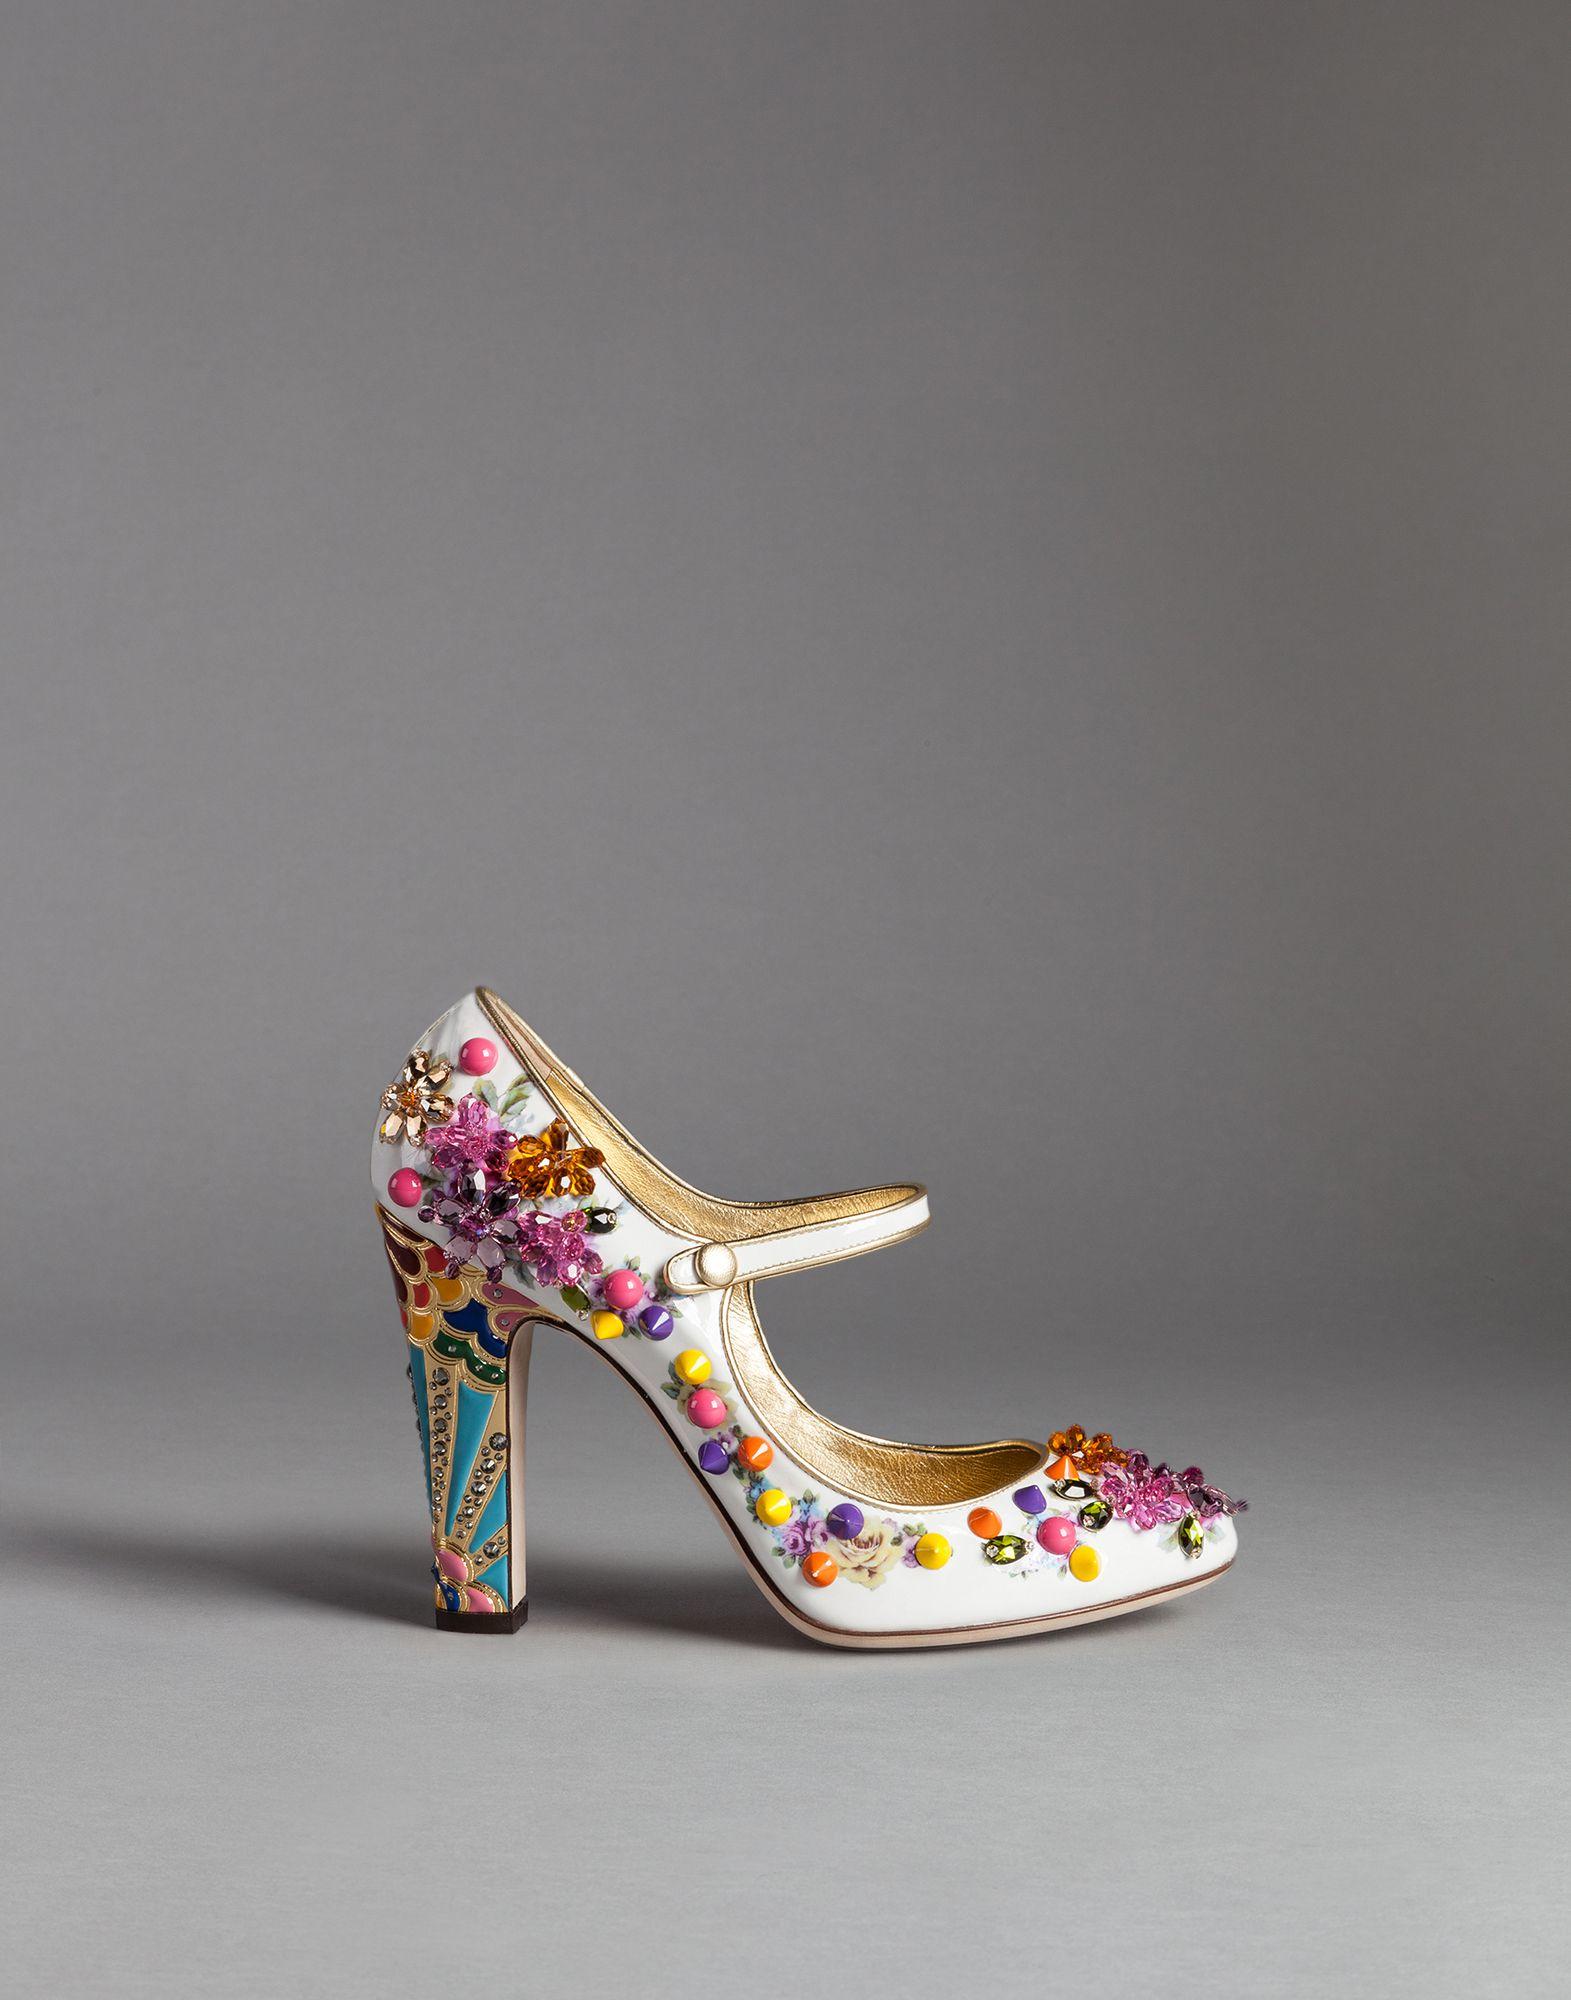 Dolce & Gabbana Pumps nappa leather Gem Sequins c2bitqorh